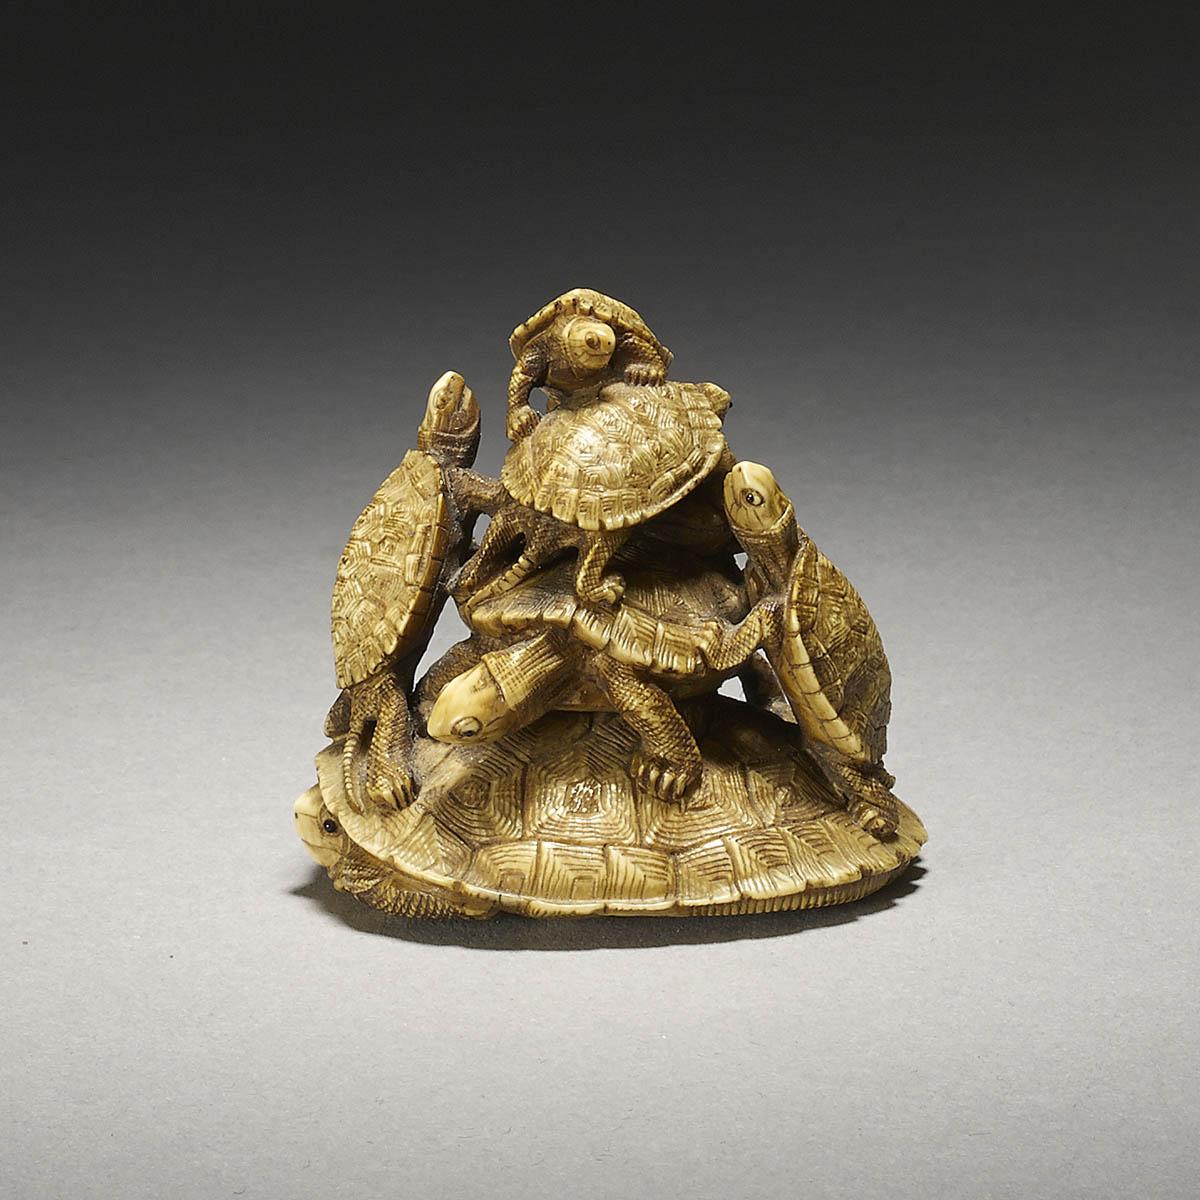 Tadakazu (Chuichi), Ivory netsuke of turtles